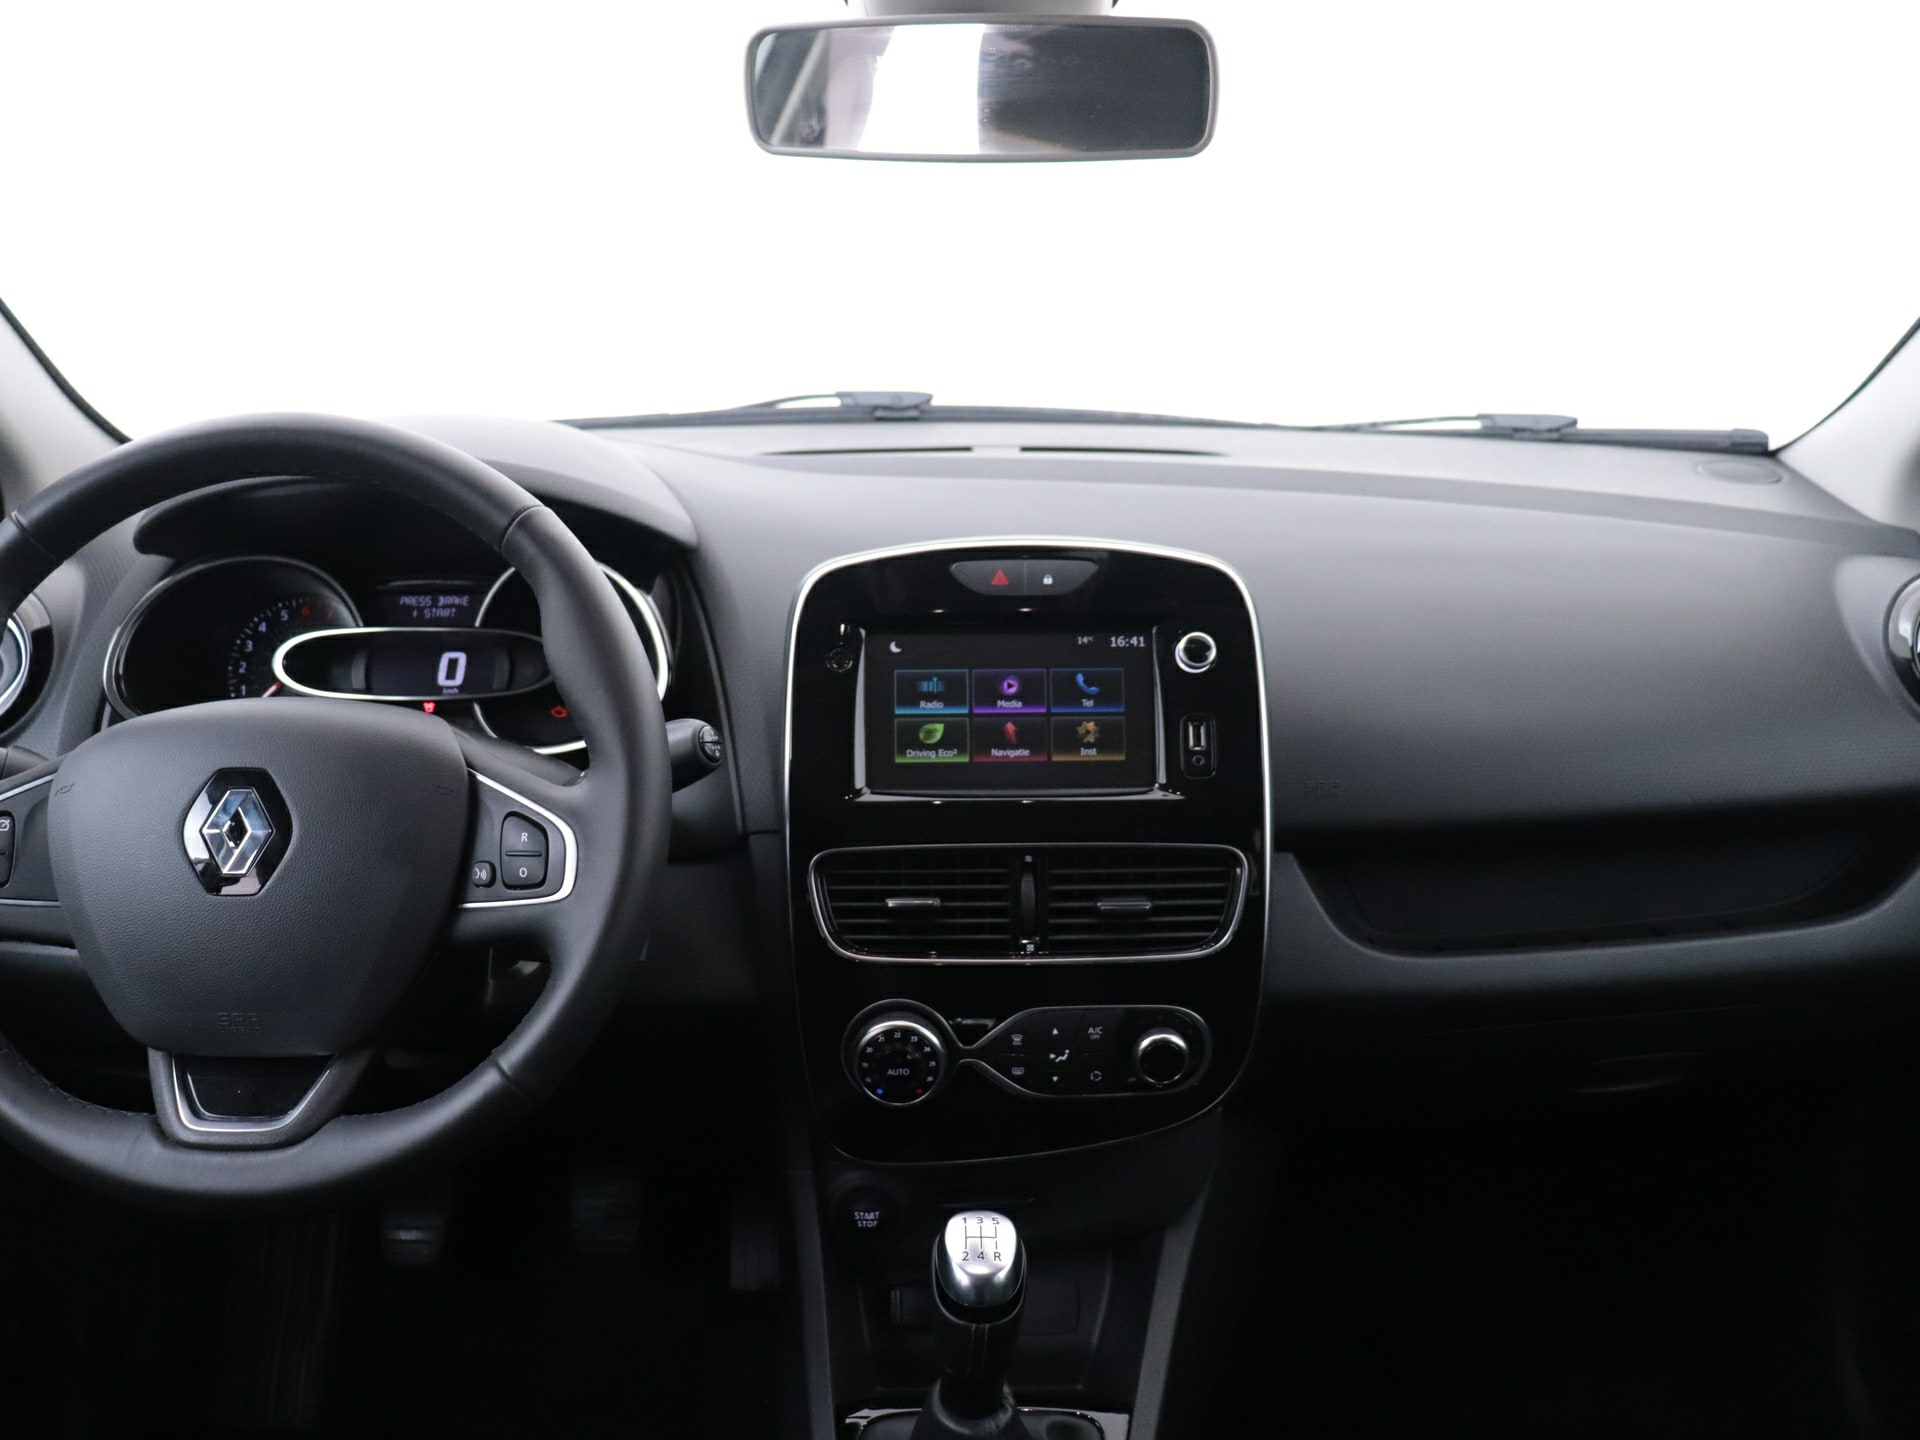 Renault Clio Estate 0.9 TCE 90PK van CarSelexy.